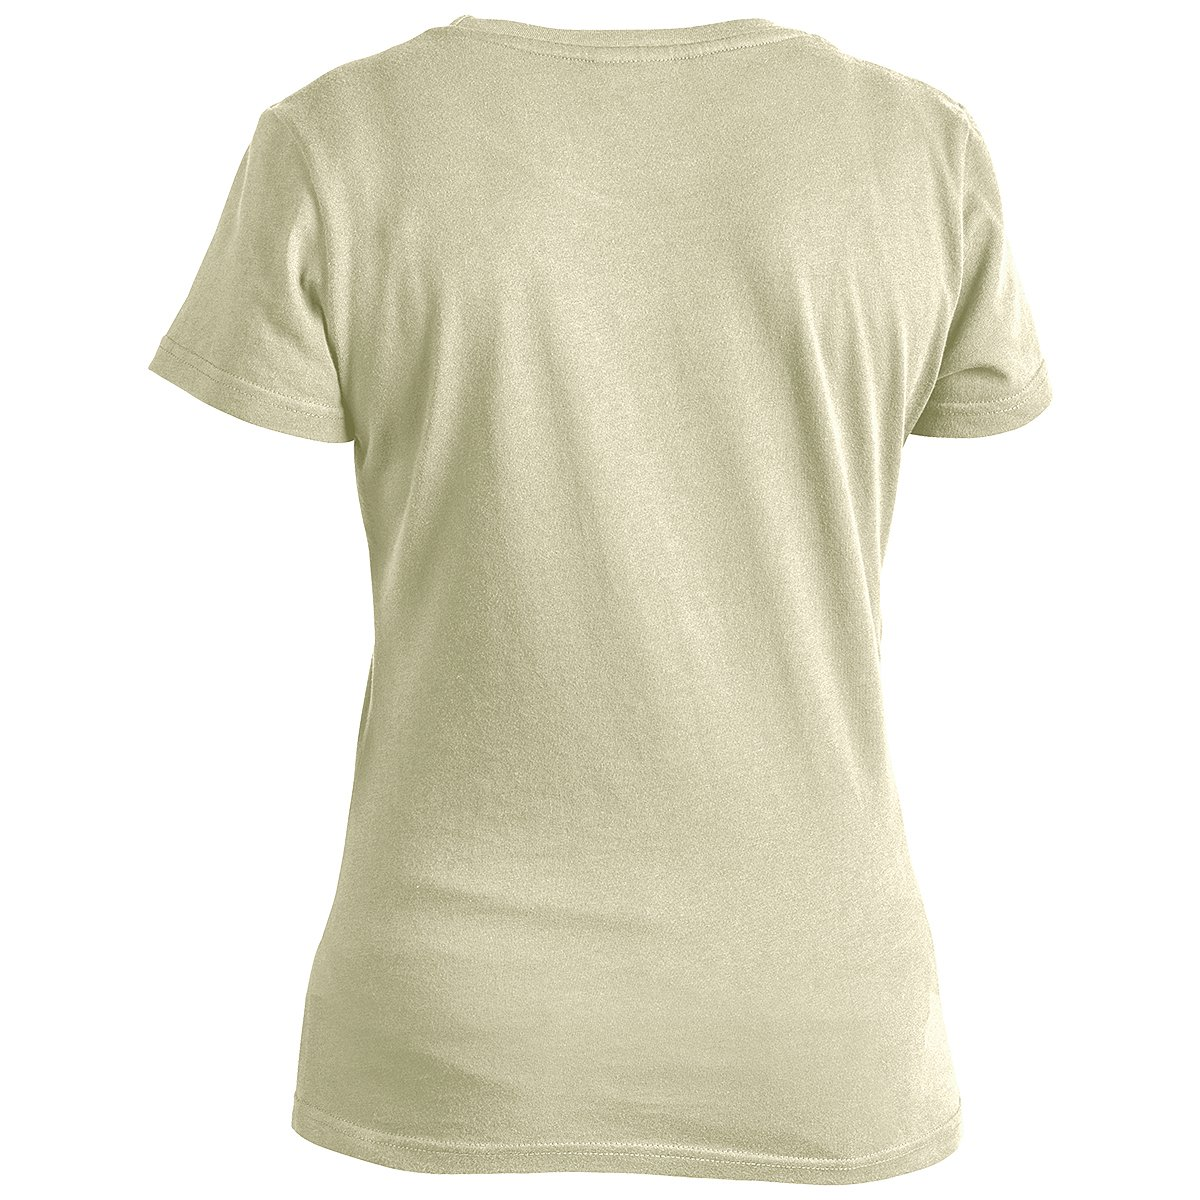 391dd2294a22ed Helikon Damen T-Shirt Khaki  Amazon.de  Bekleidung